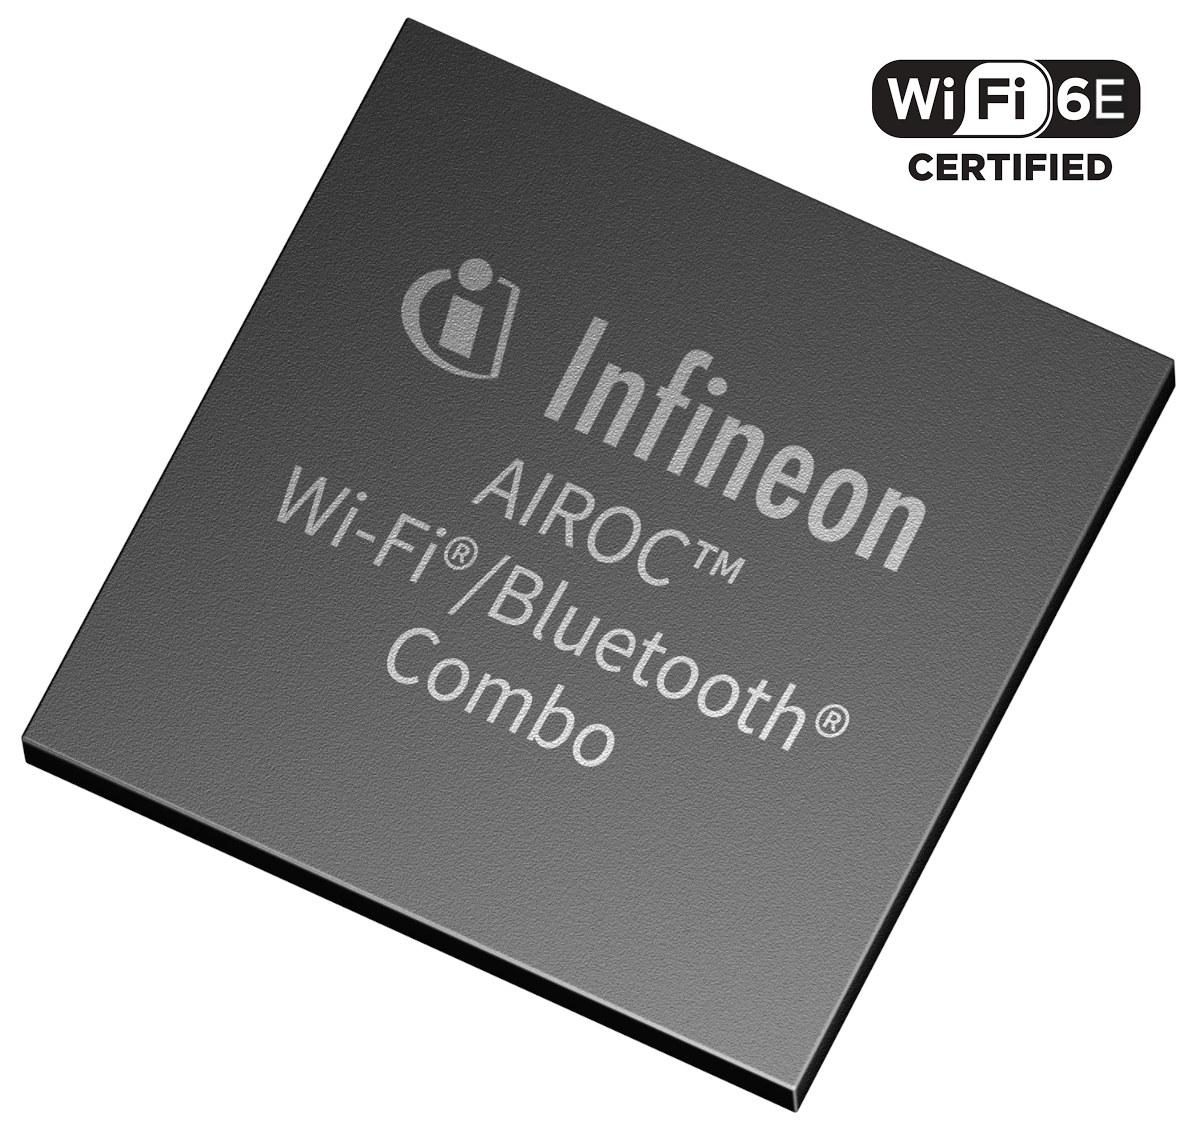 Infineon AIROC WiFi 6E Chipset